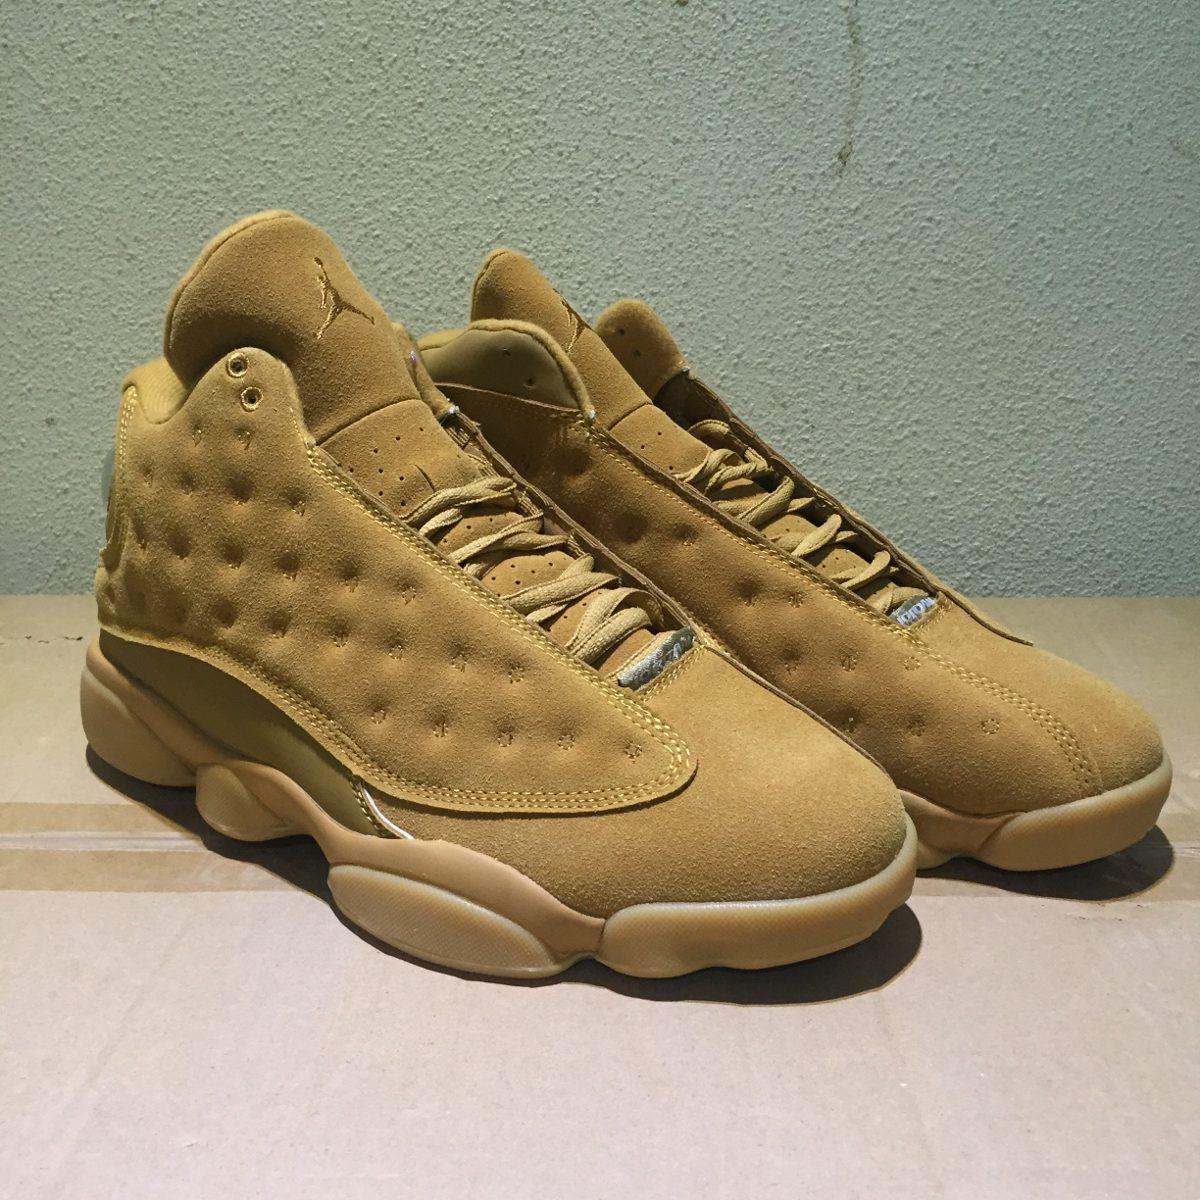 huge sale e0ea9 52618 Jordan Retro 13 Top Quality A1